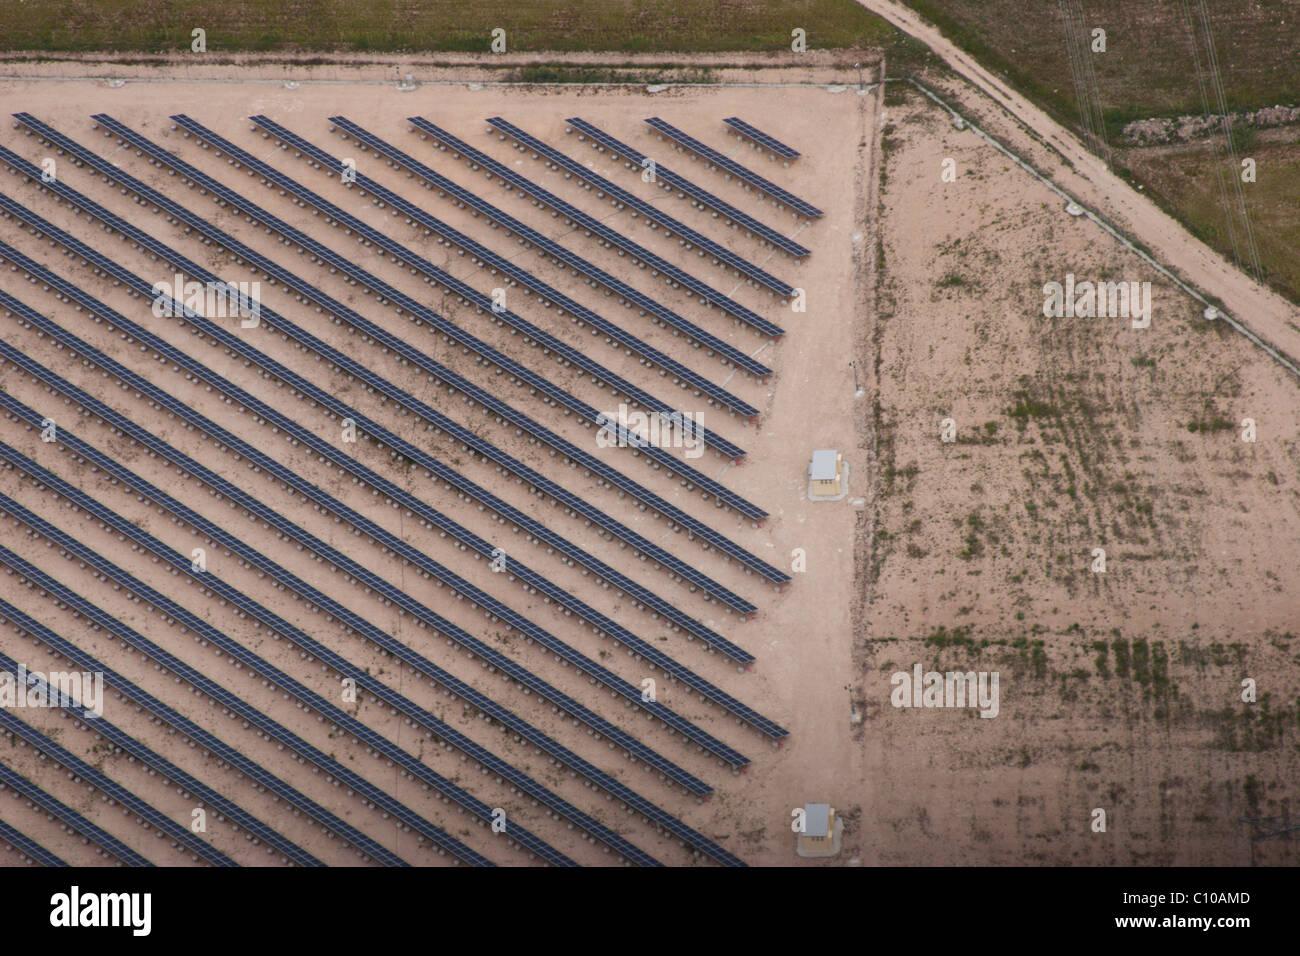 solar panels Spain corner market hot dry sunny electricity green power environment environmental sustainable energy - Stock Image